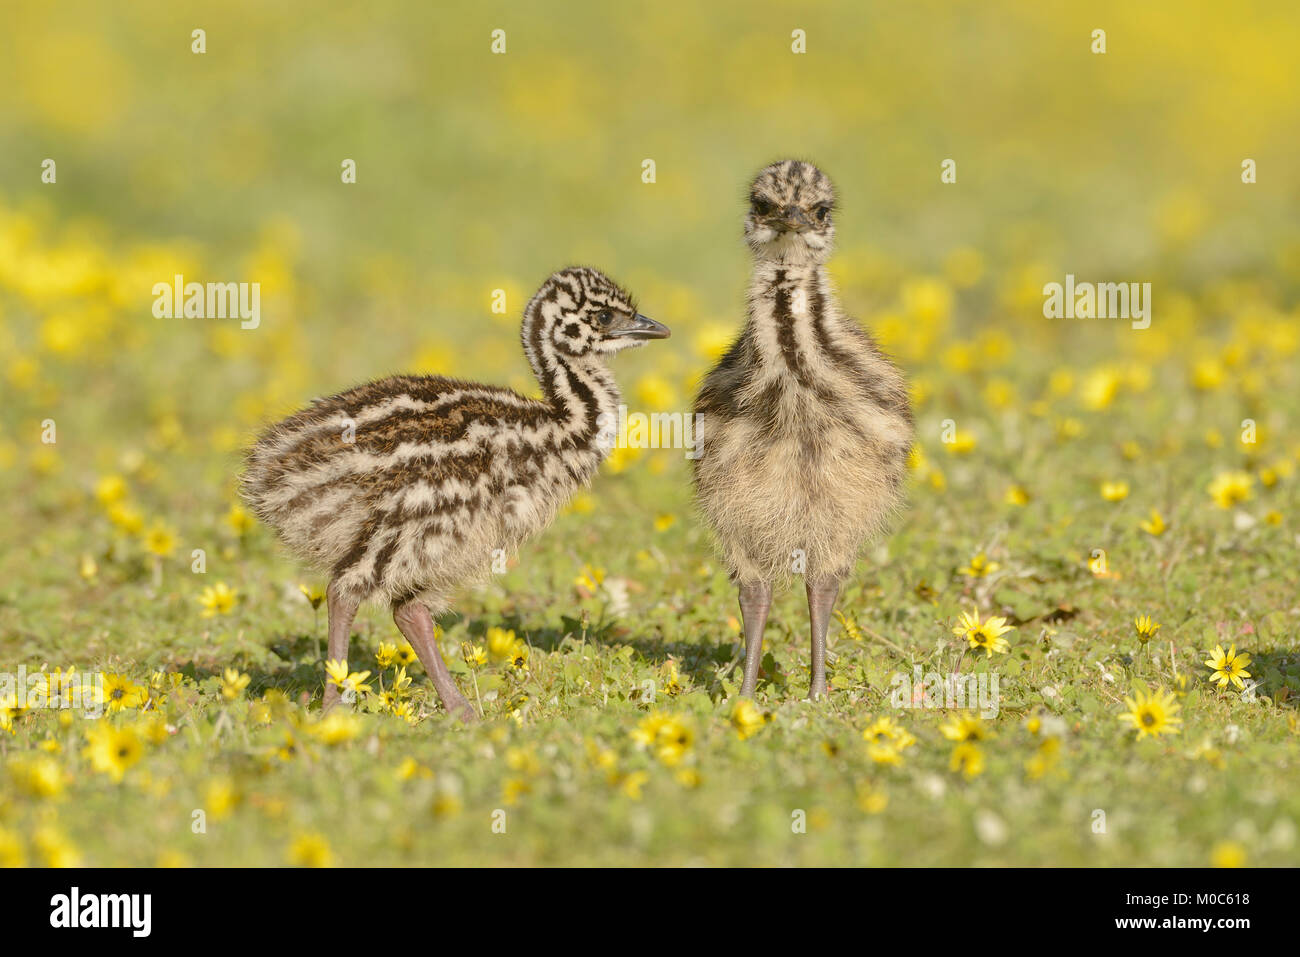 Emu Dromaius novaehollandiae Chicks Photographed in Victoria, Australia Stock Photo